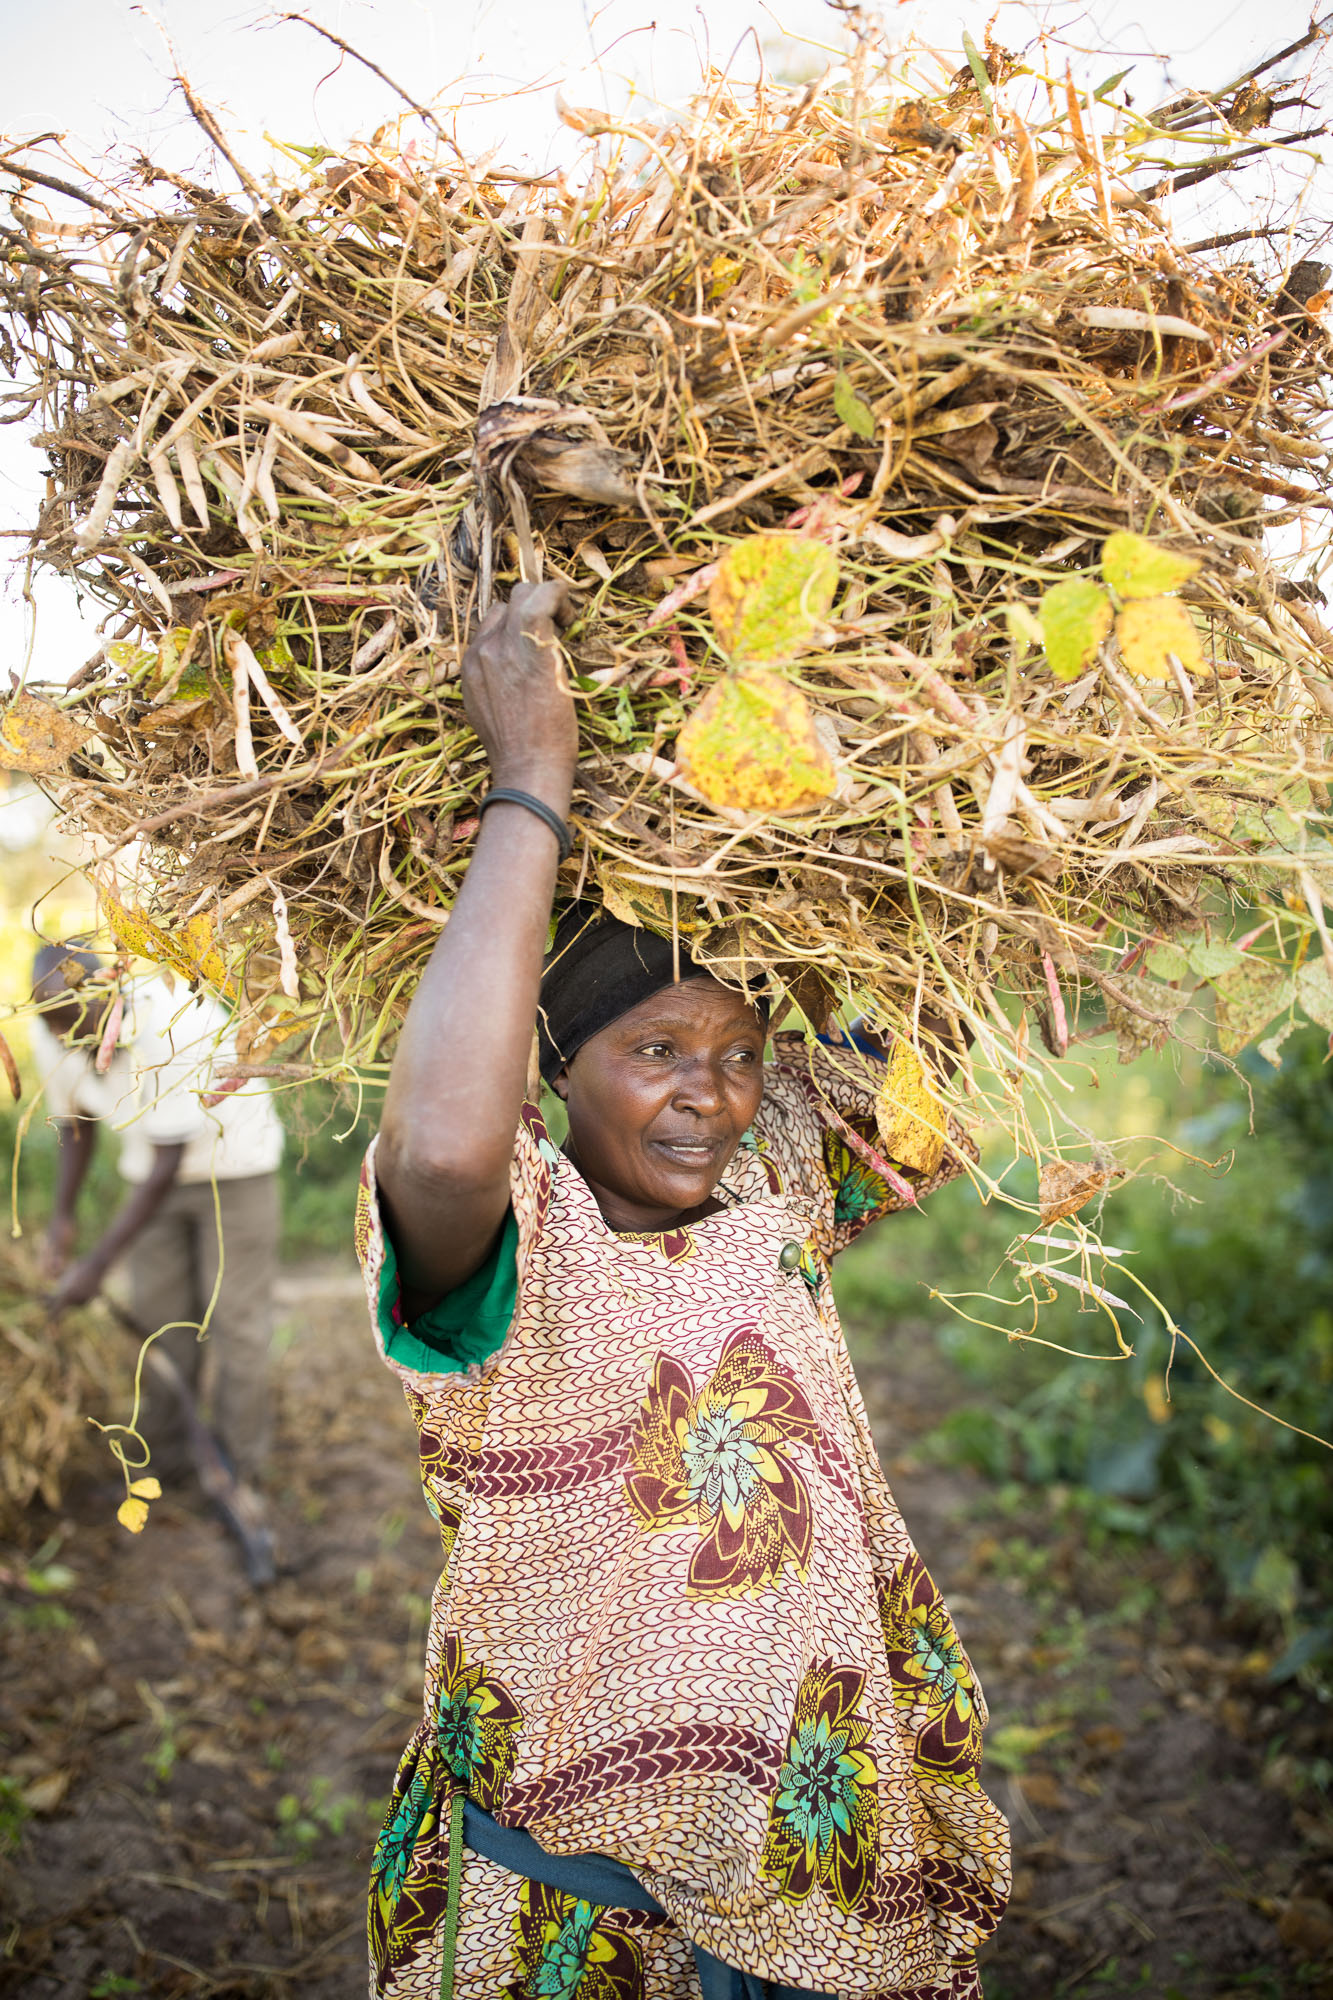 A small farmer harvests fresh beans in abundance in central Uganda.